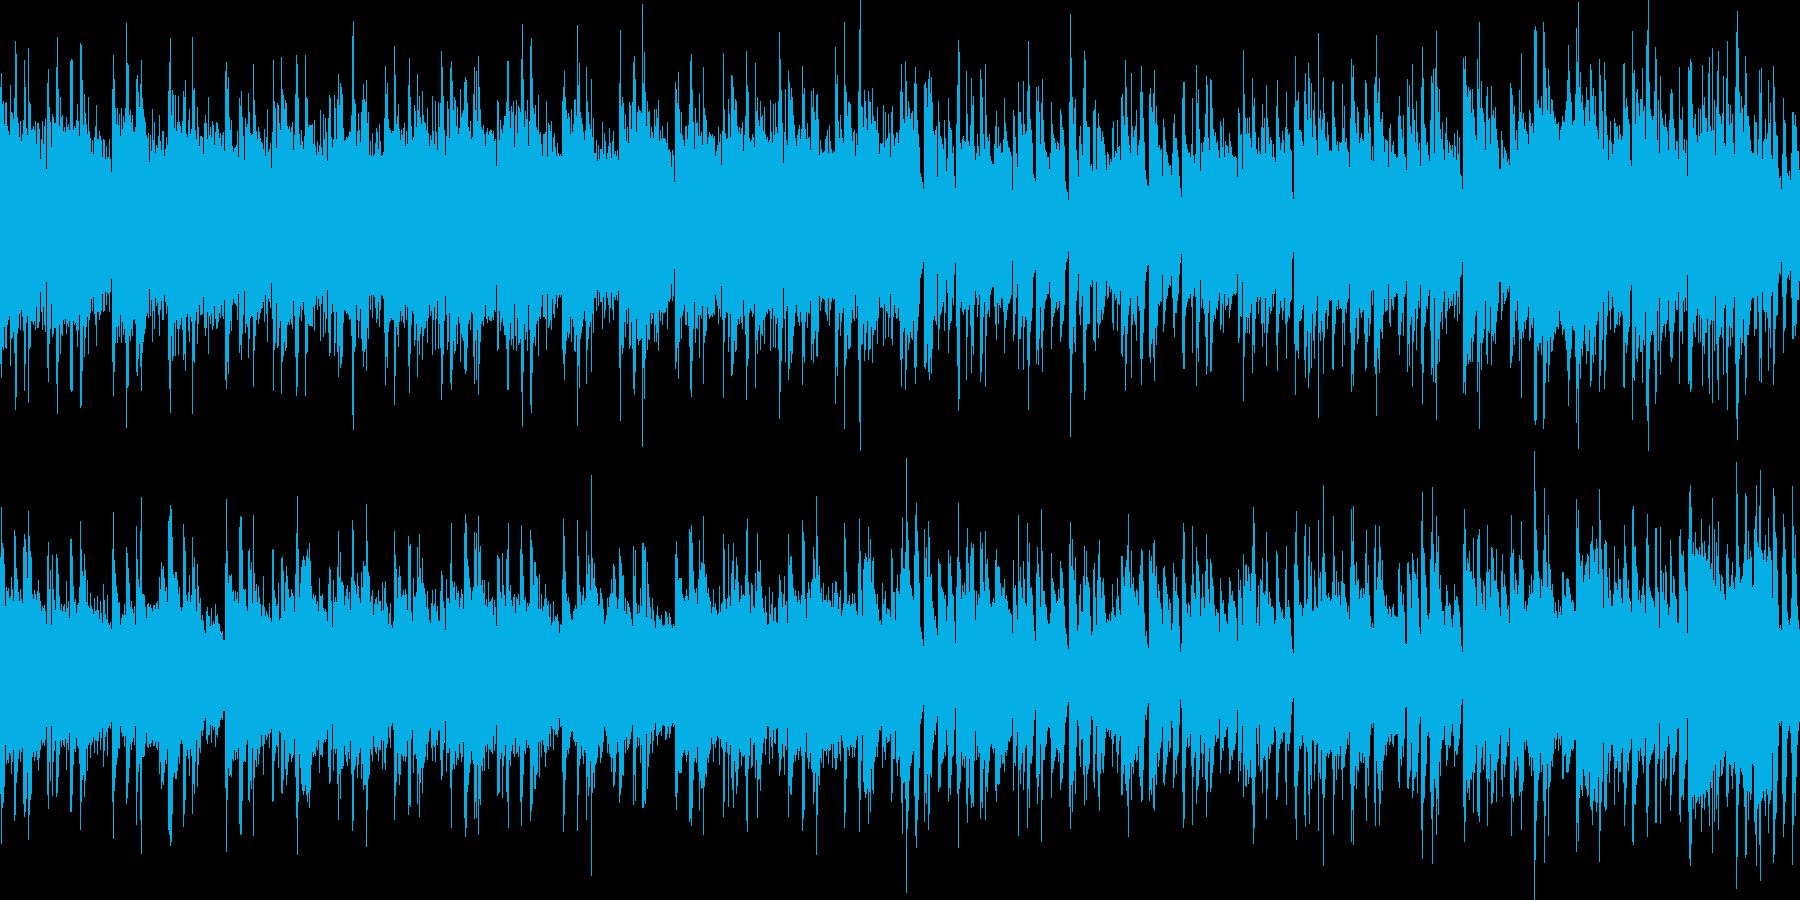 RPGバトルに シリアス妖艶ピアノジャズの再生済みの波形